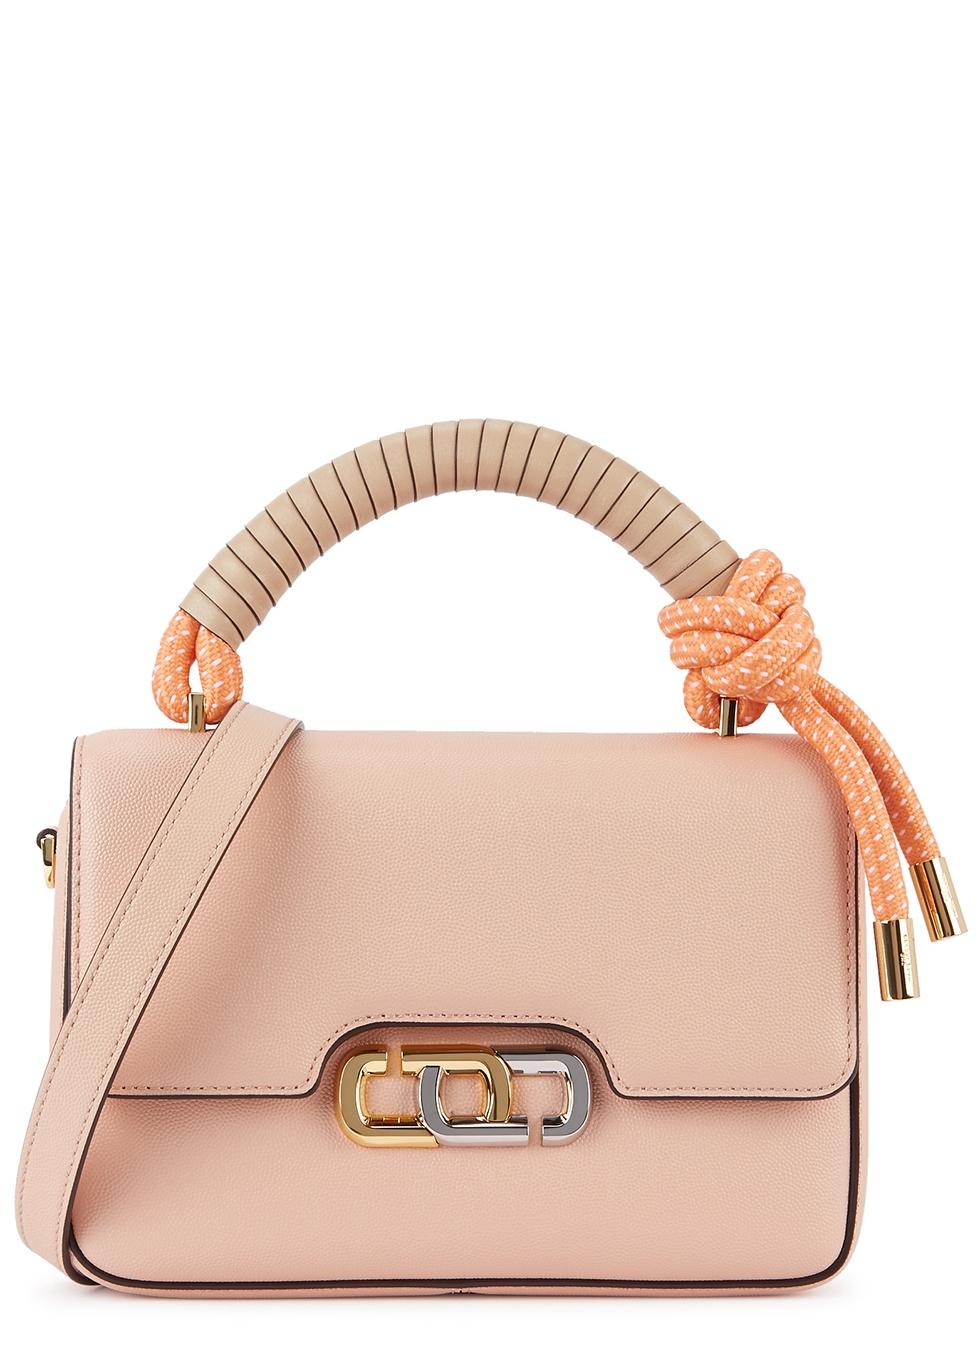 The J Link light pink leather top handle bag